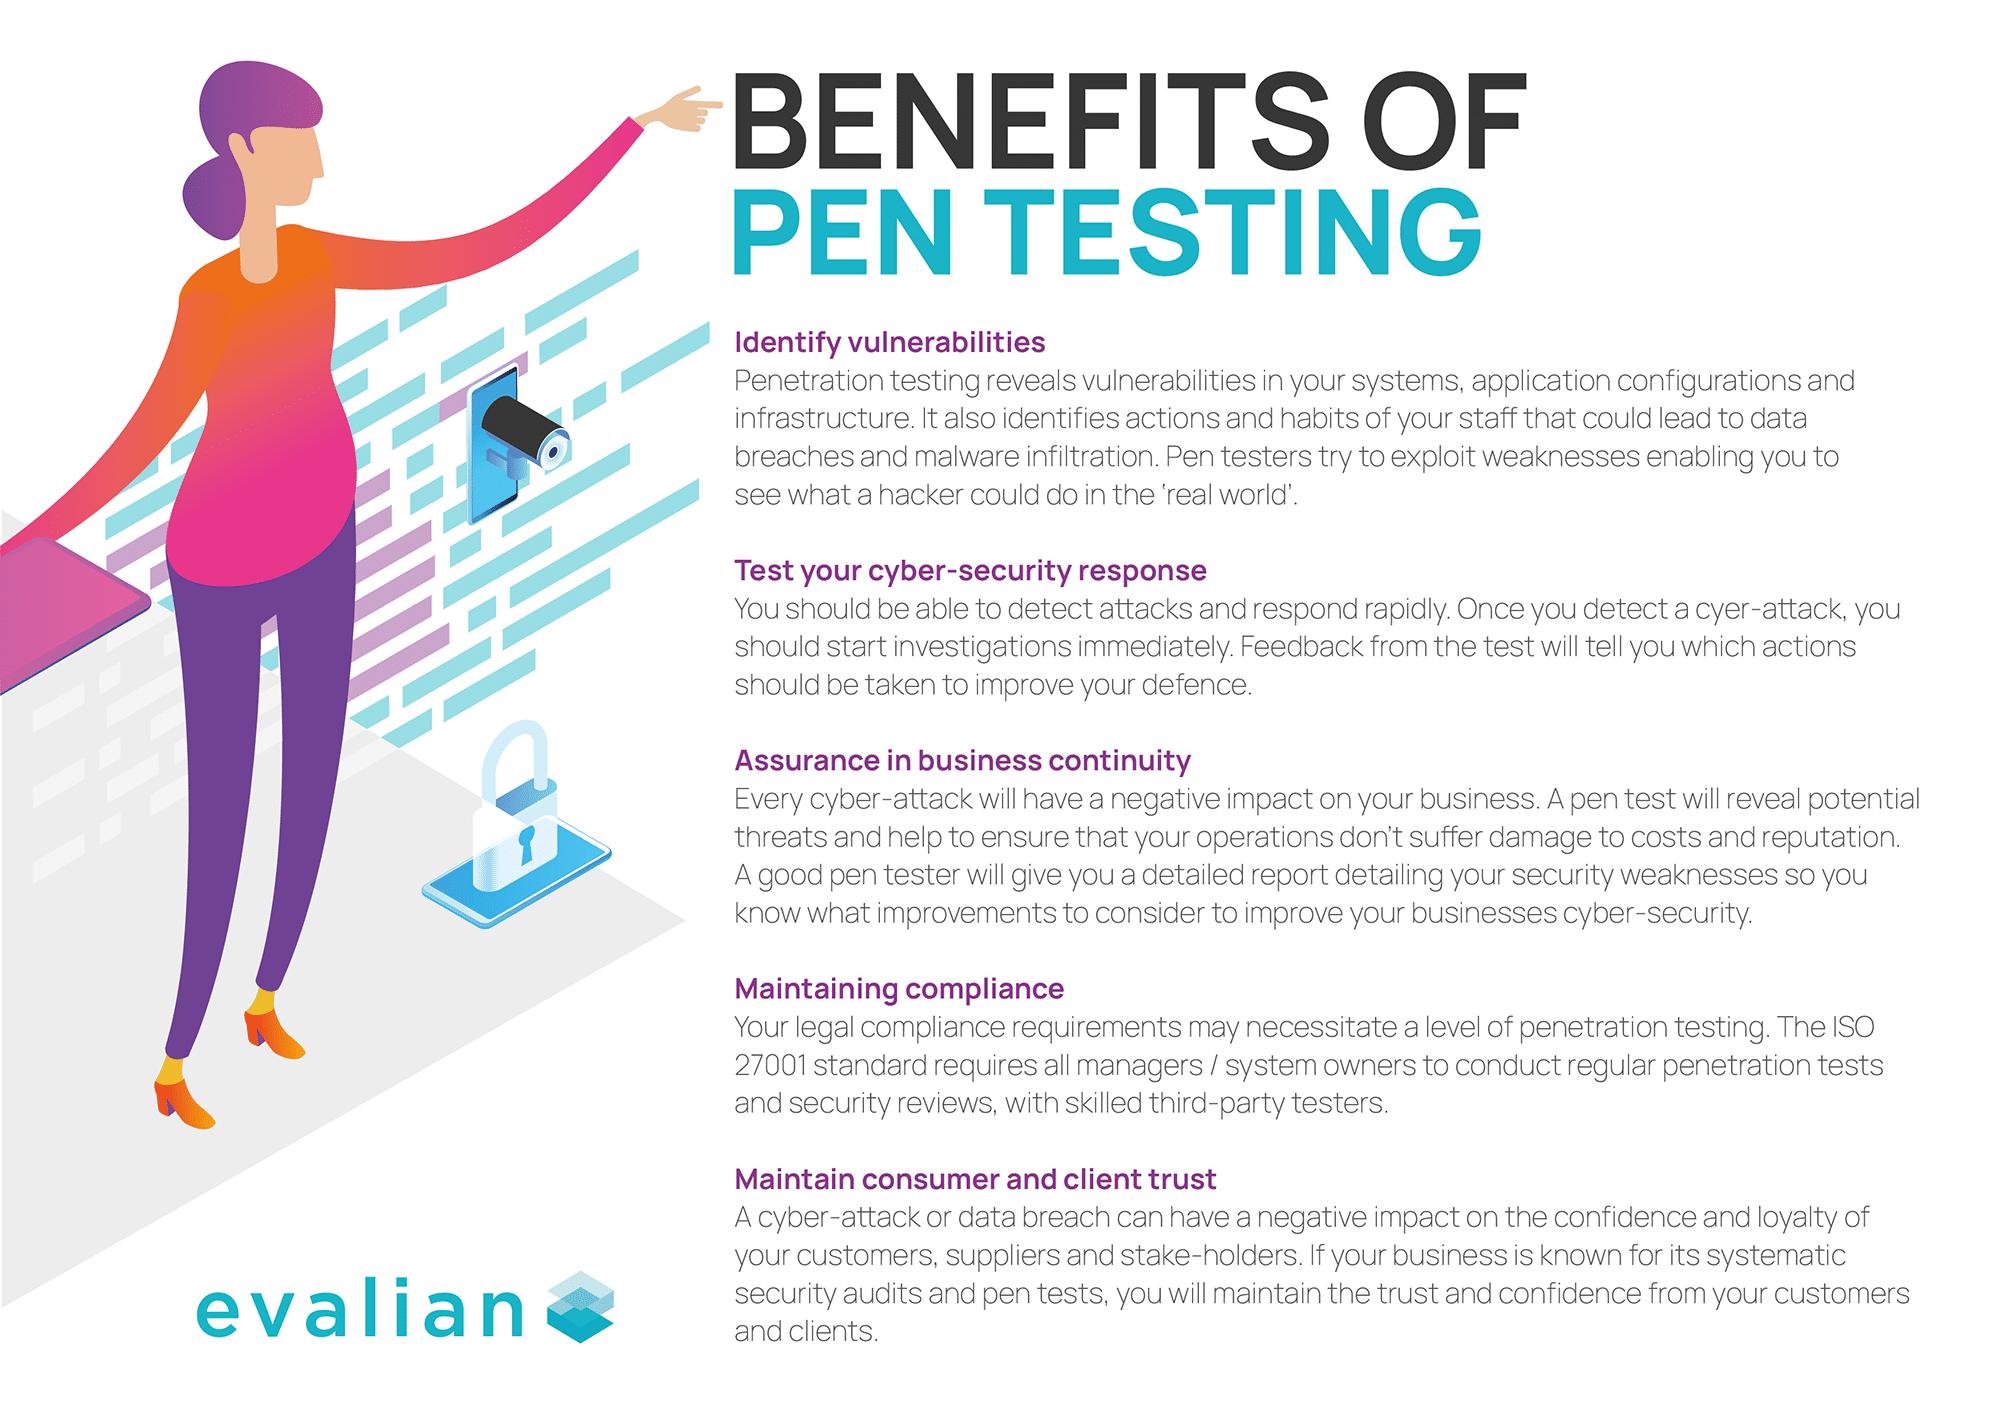 Benefits of Pen Testing